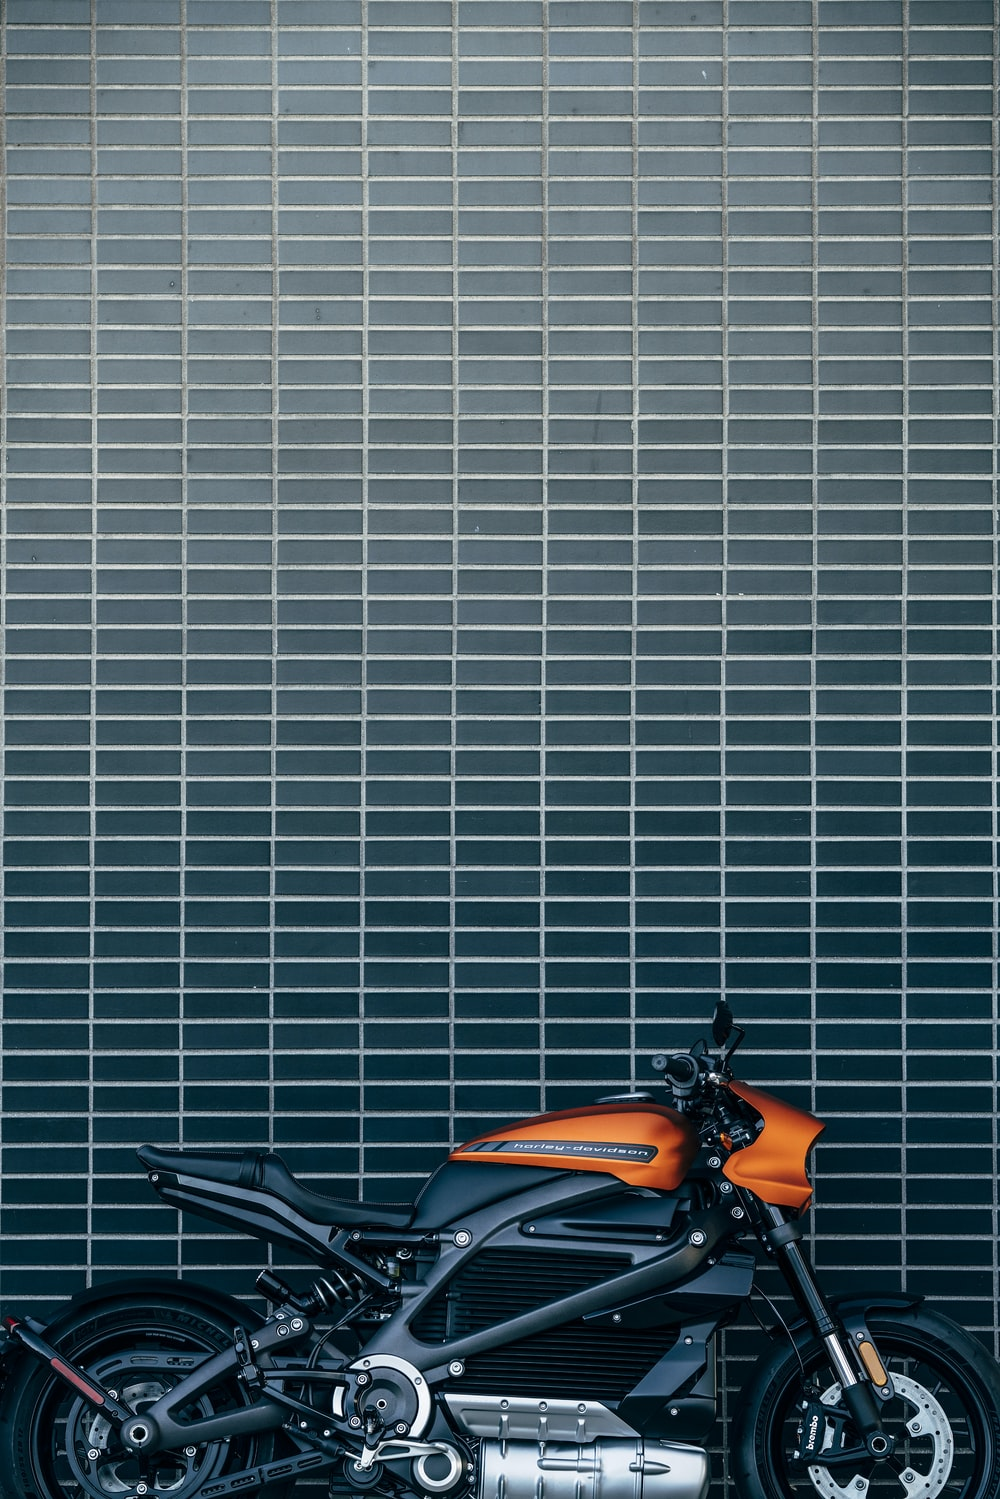 orange and black motorcycle